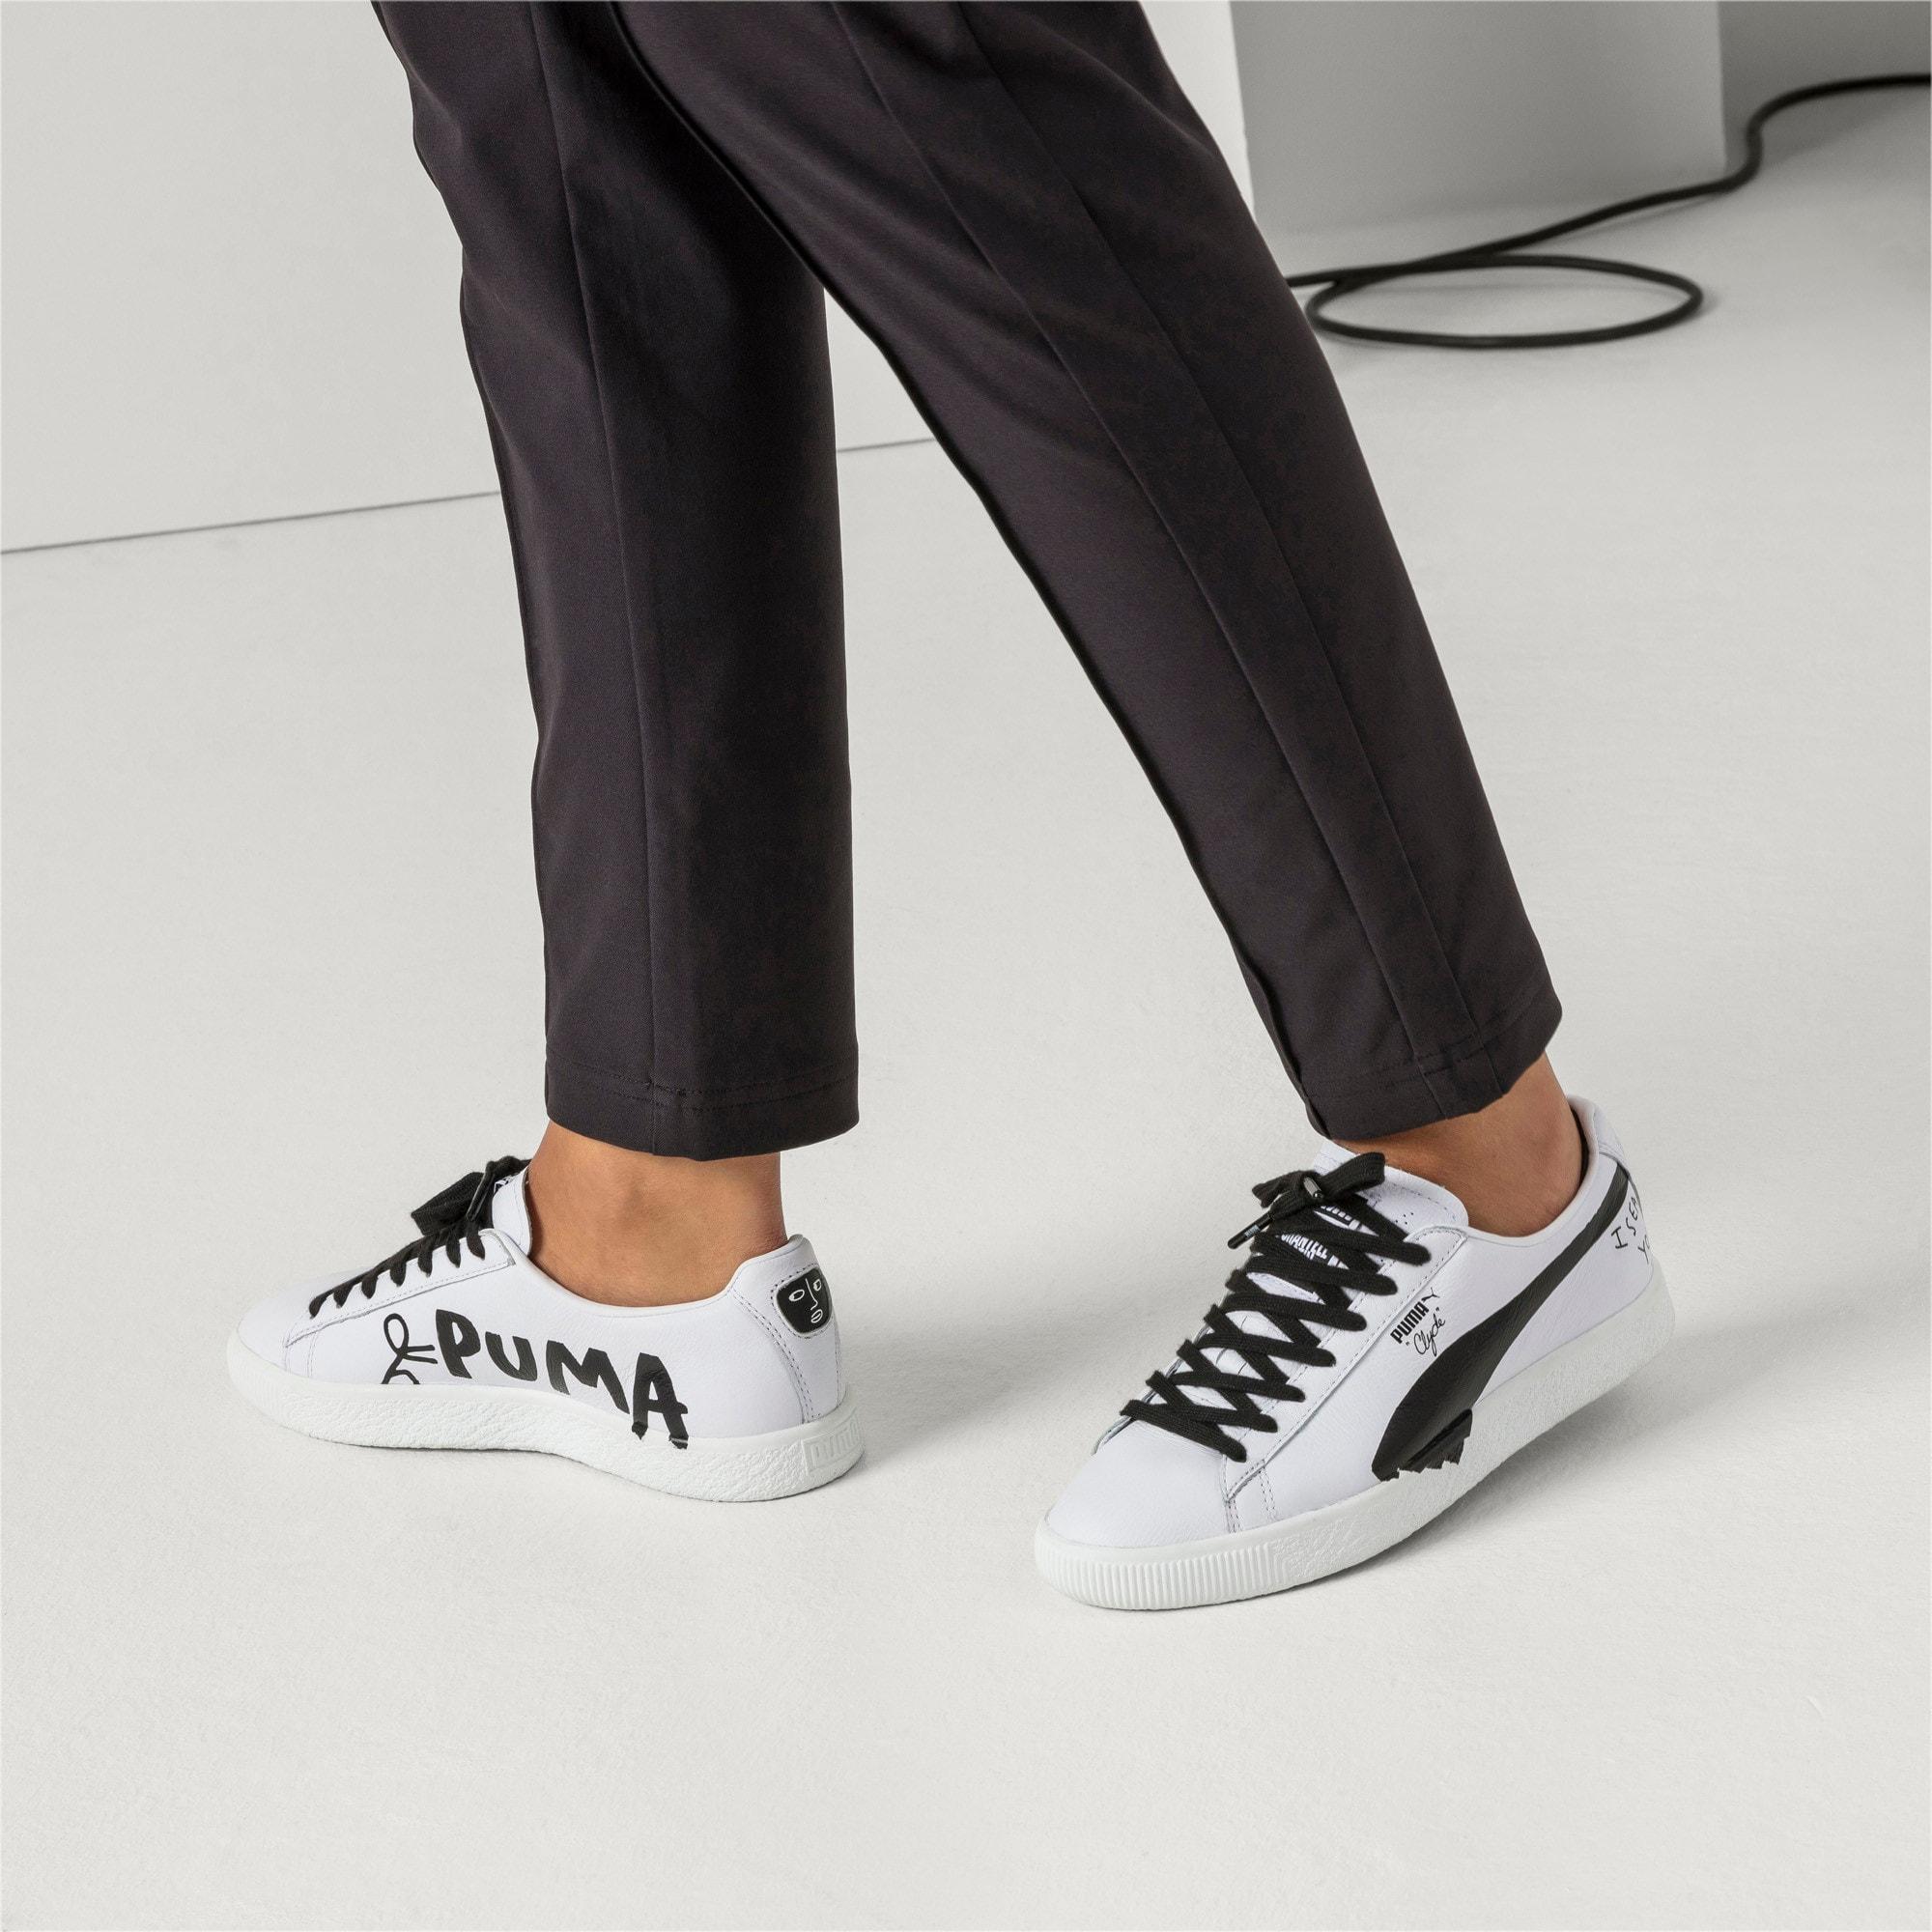 Thumbnail 7 of PUMA x SHANTELL MARTIN Clyde Sneakers, Puma White-Puma Black, medium